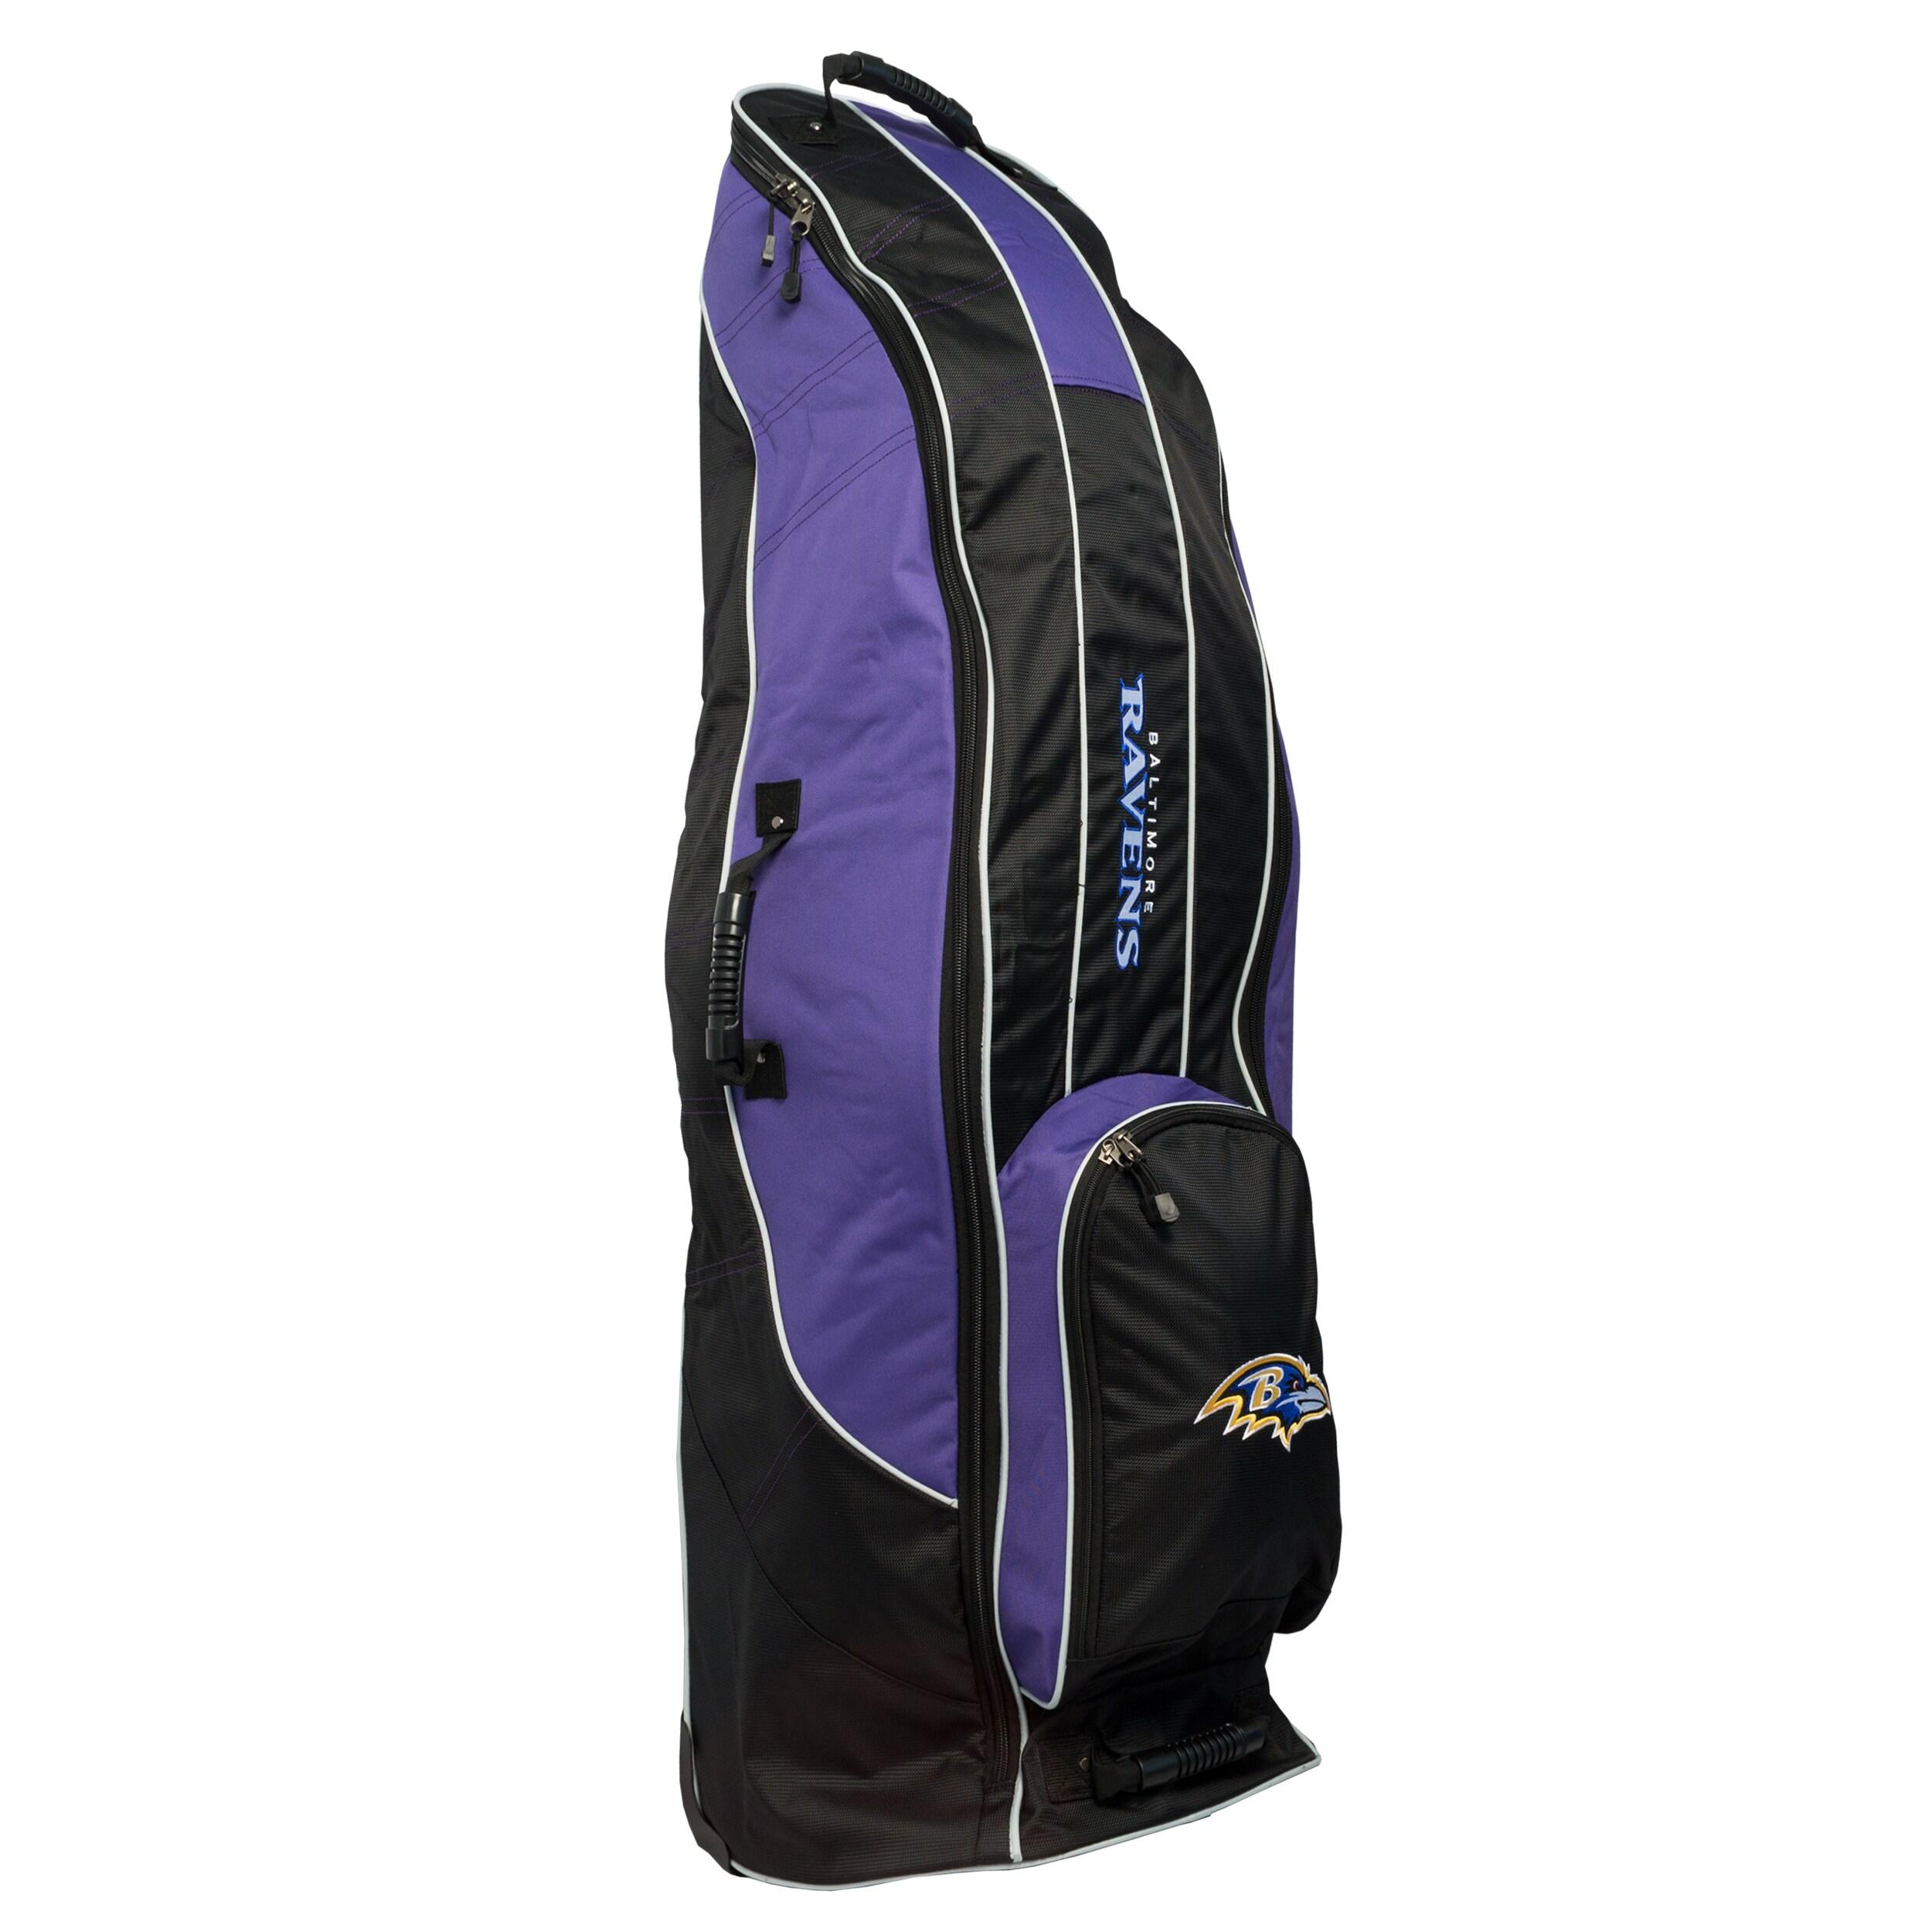 Baltimore Ravens Team Golf Travel Bag